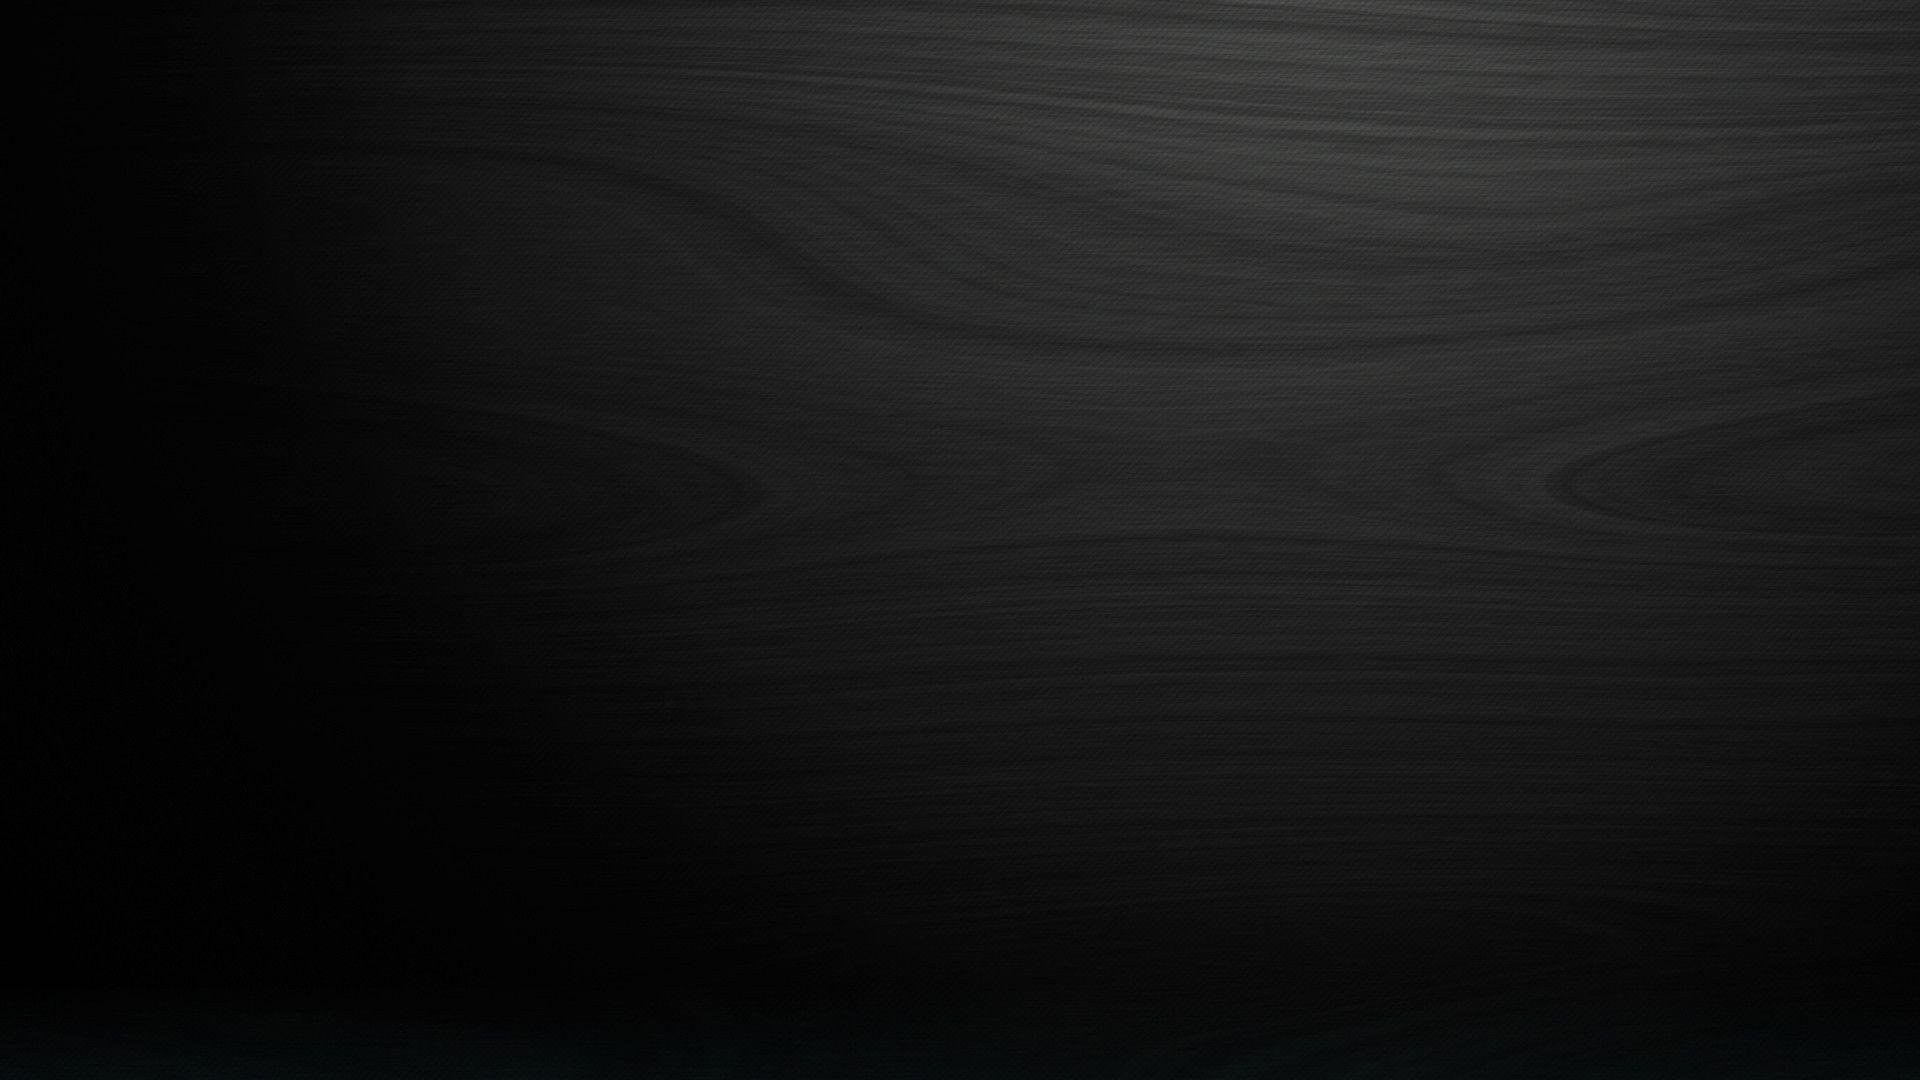 black background - 10 - hipwallpaper